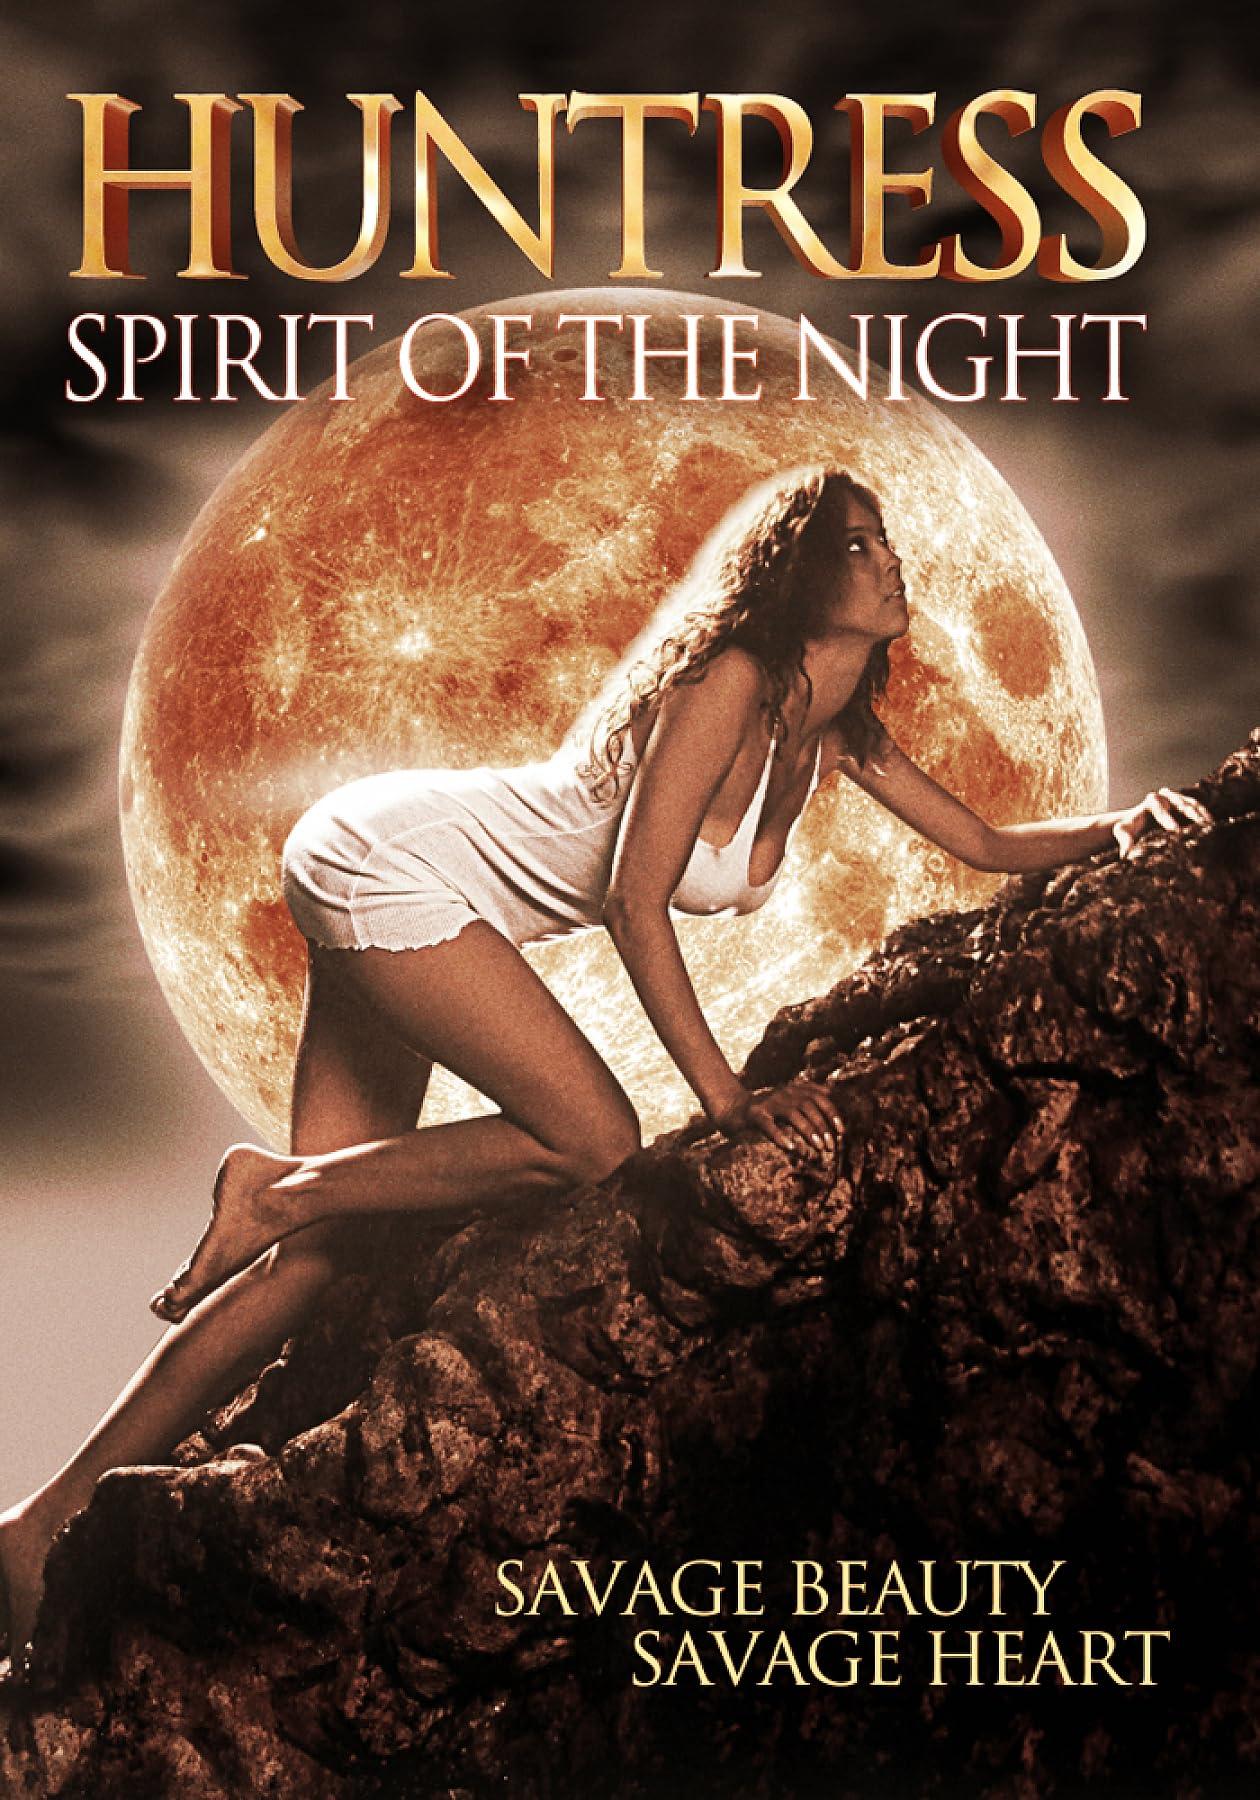 Huntress: Spirit of the Night (1995) Hindi Dubbed